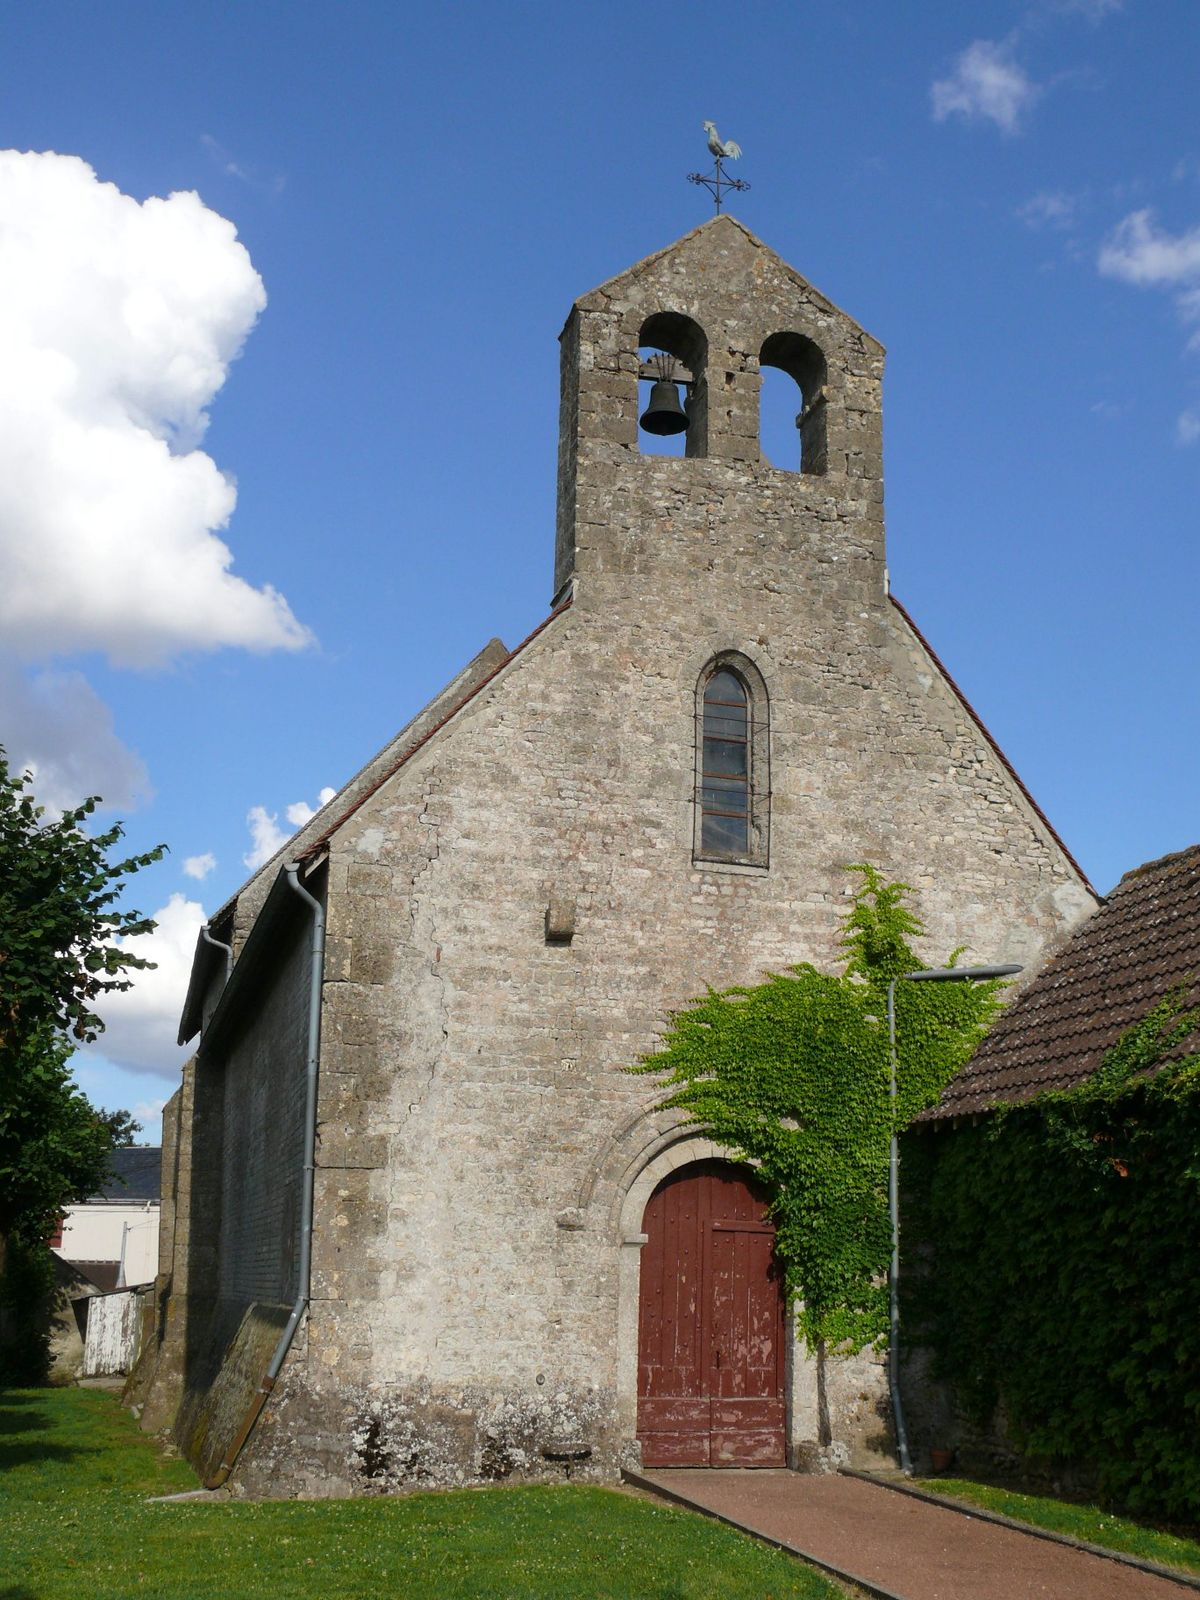 Glise saint pierre d 39 intville la gu tard wikidata for Association maison eymard